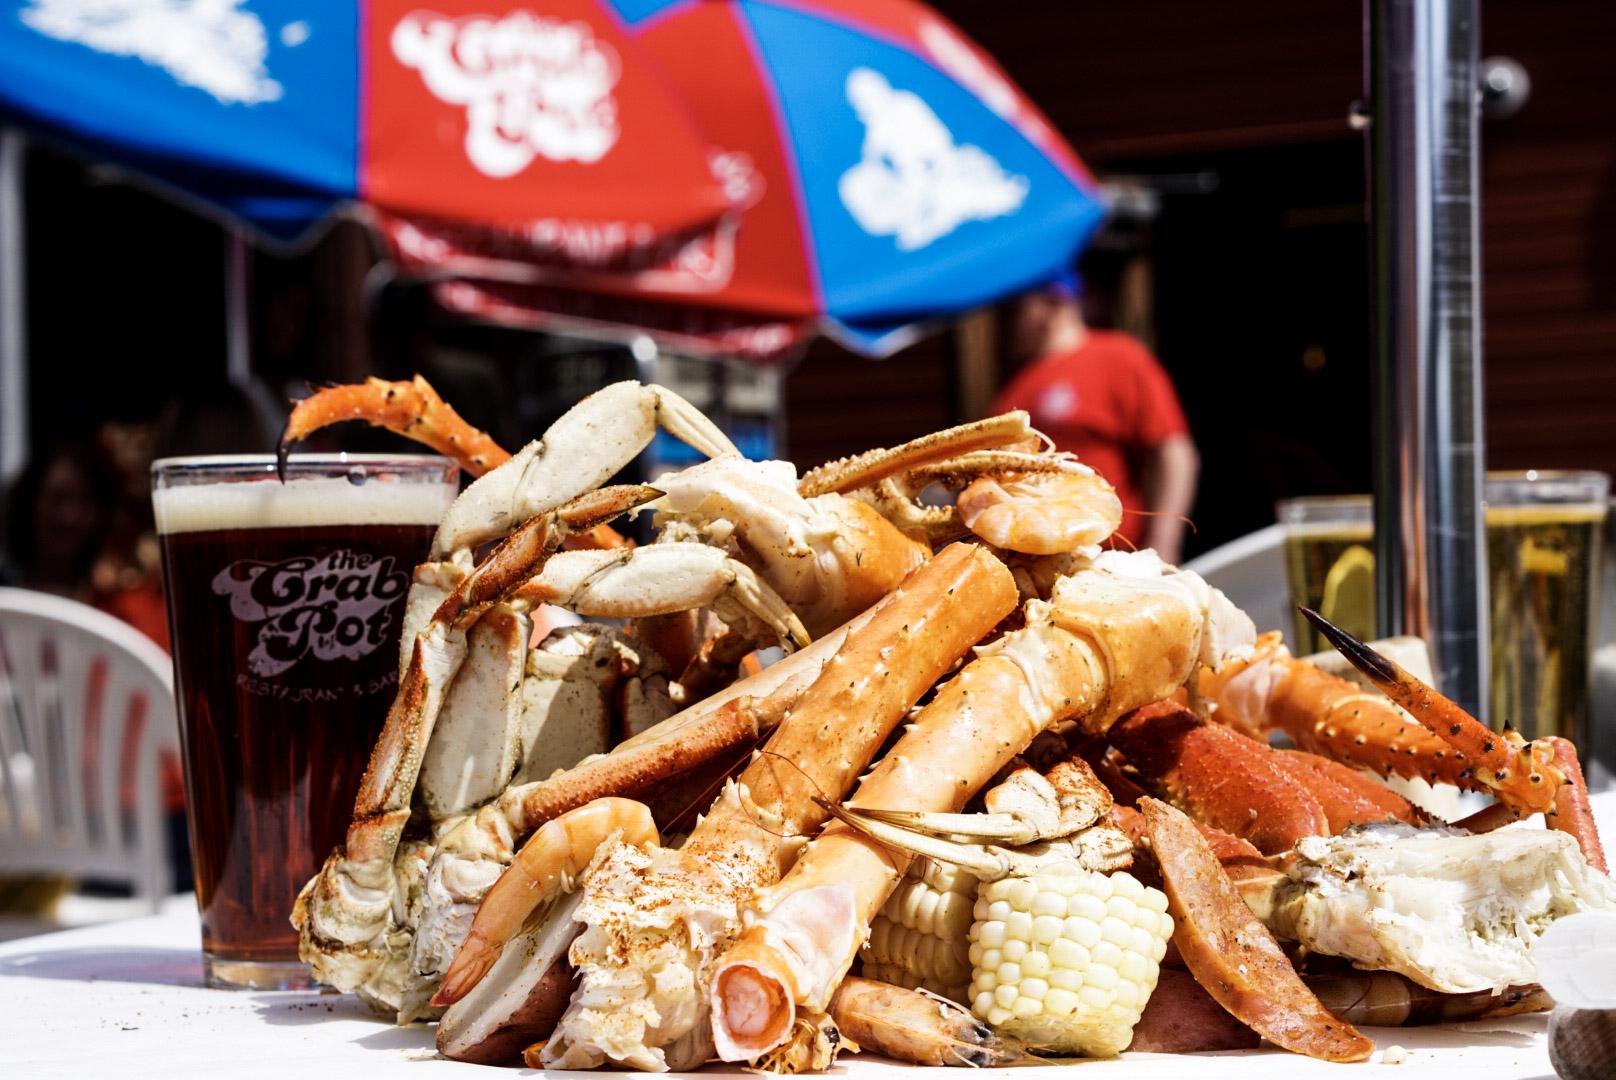 Royal_Crab_Feast_10.jpg